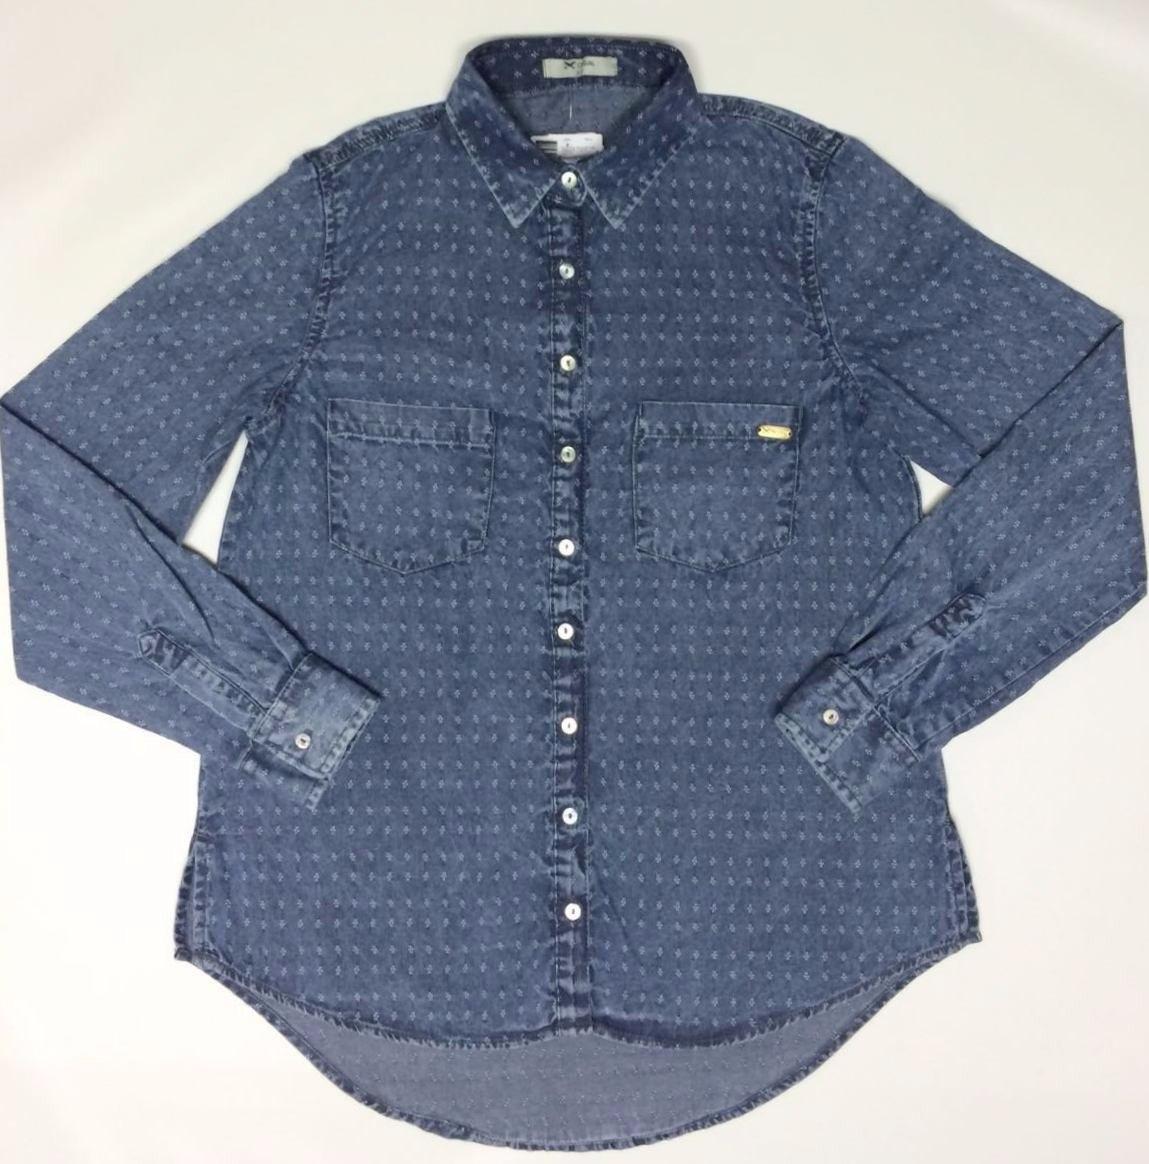 e776bf2cc7 camisa jeans trabalhada manga longa feminina - hering. Carregando zoom.